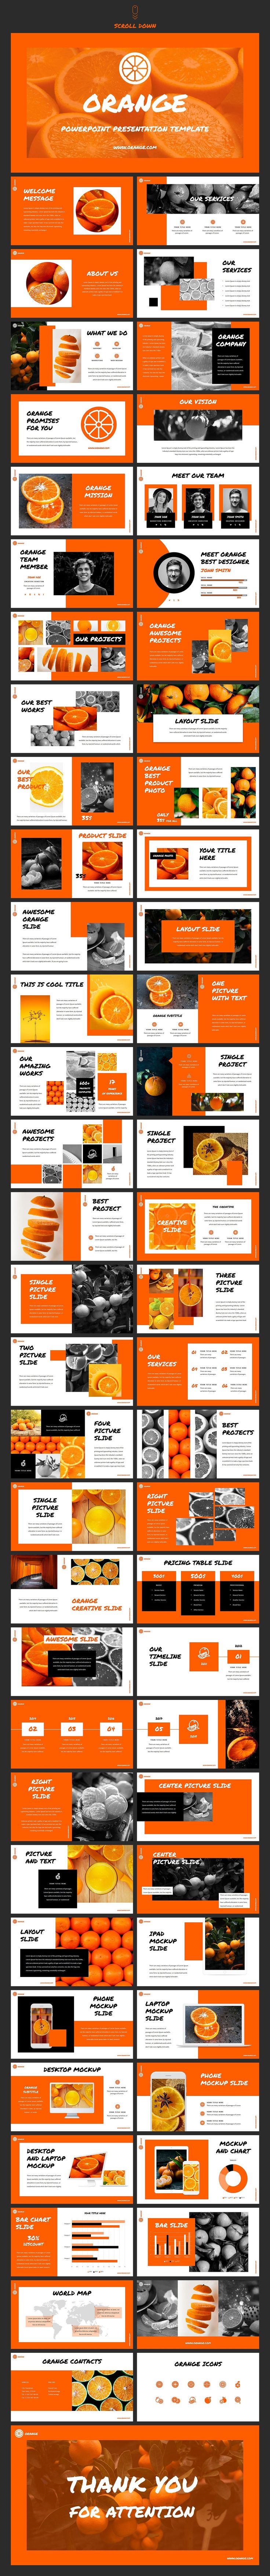 Orange - Powerpoint Template by Helga_Design on @creativemarket